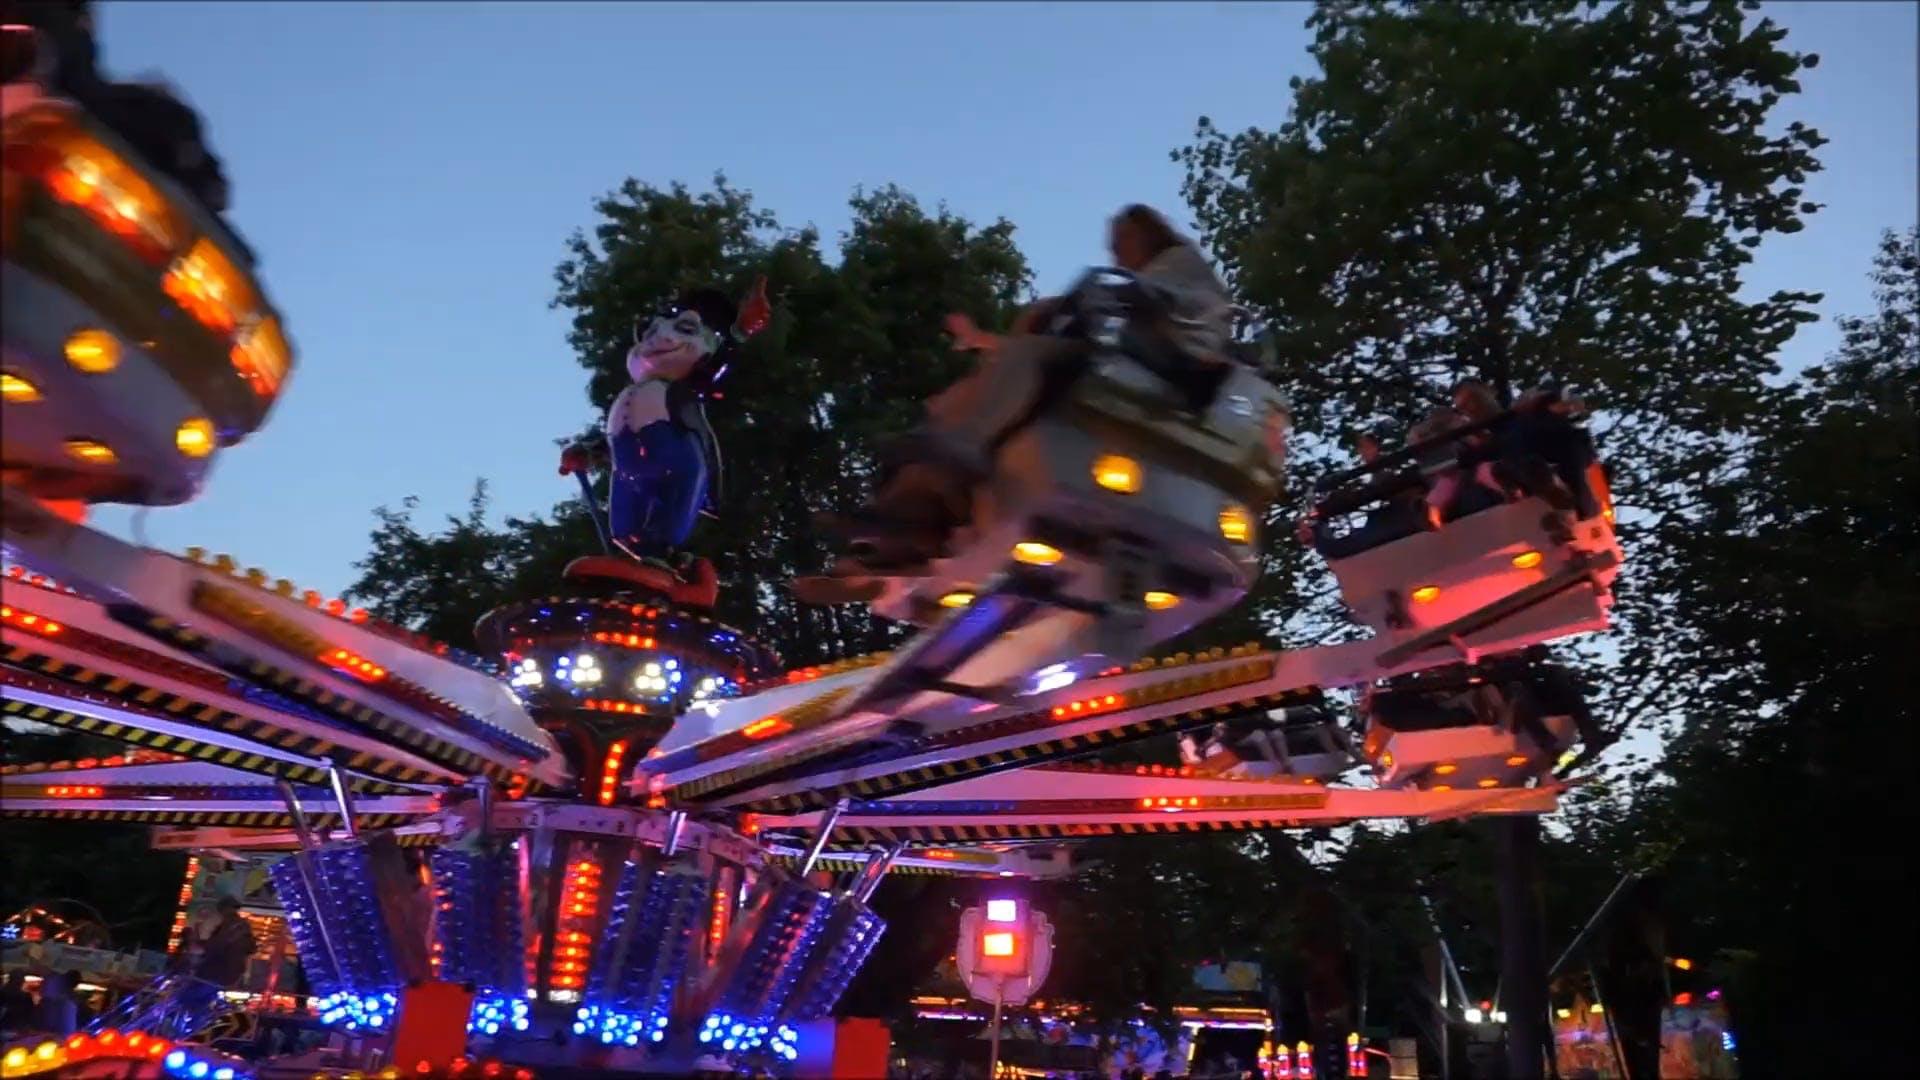 People Having Fun At An Amusement Park